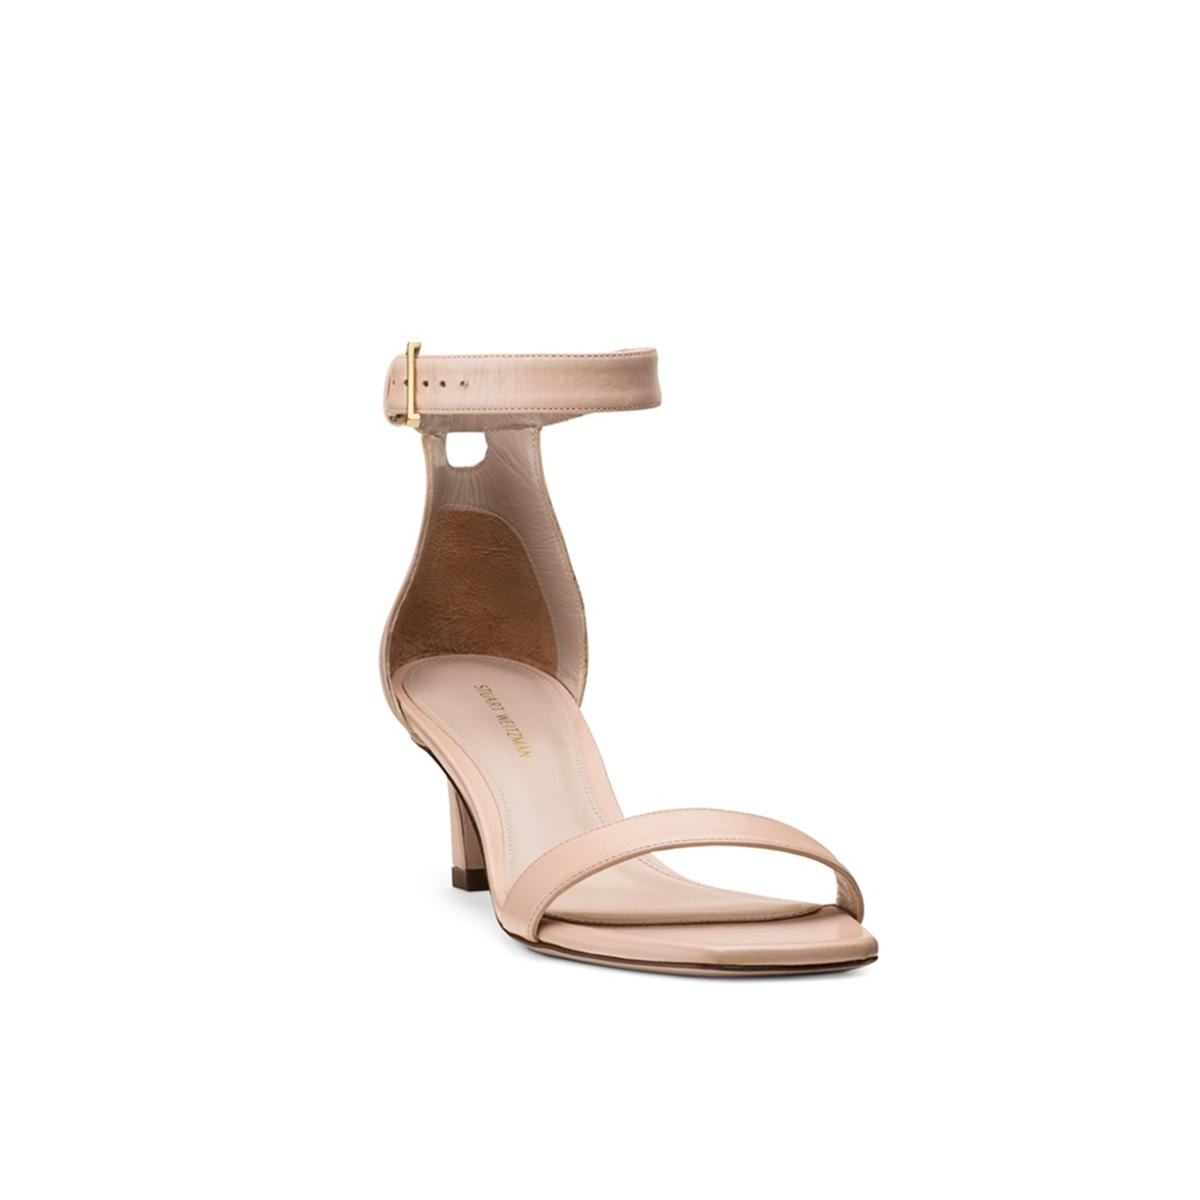 blush stuart weitzman heel and ankle strap.jpg